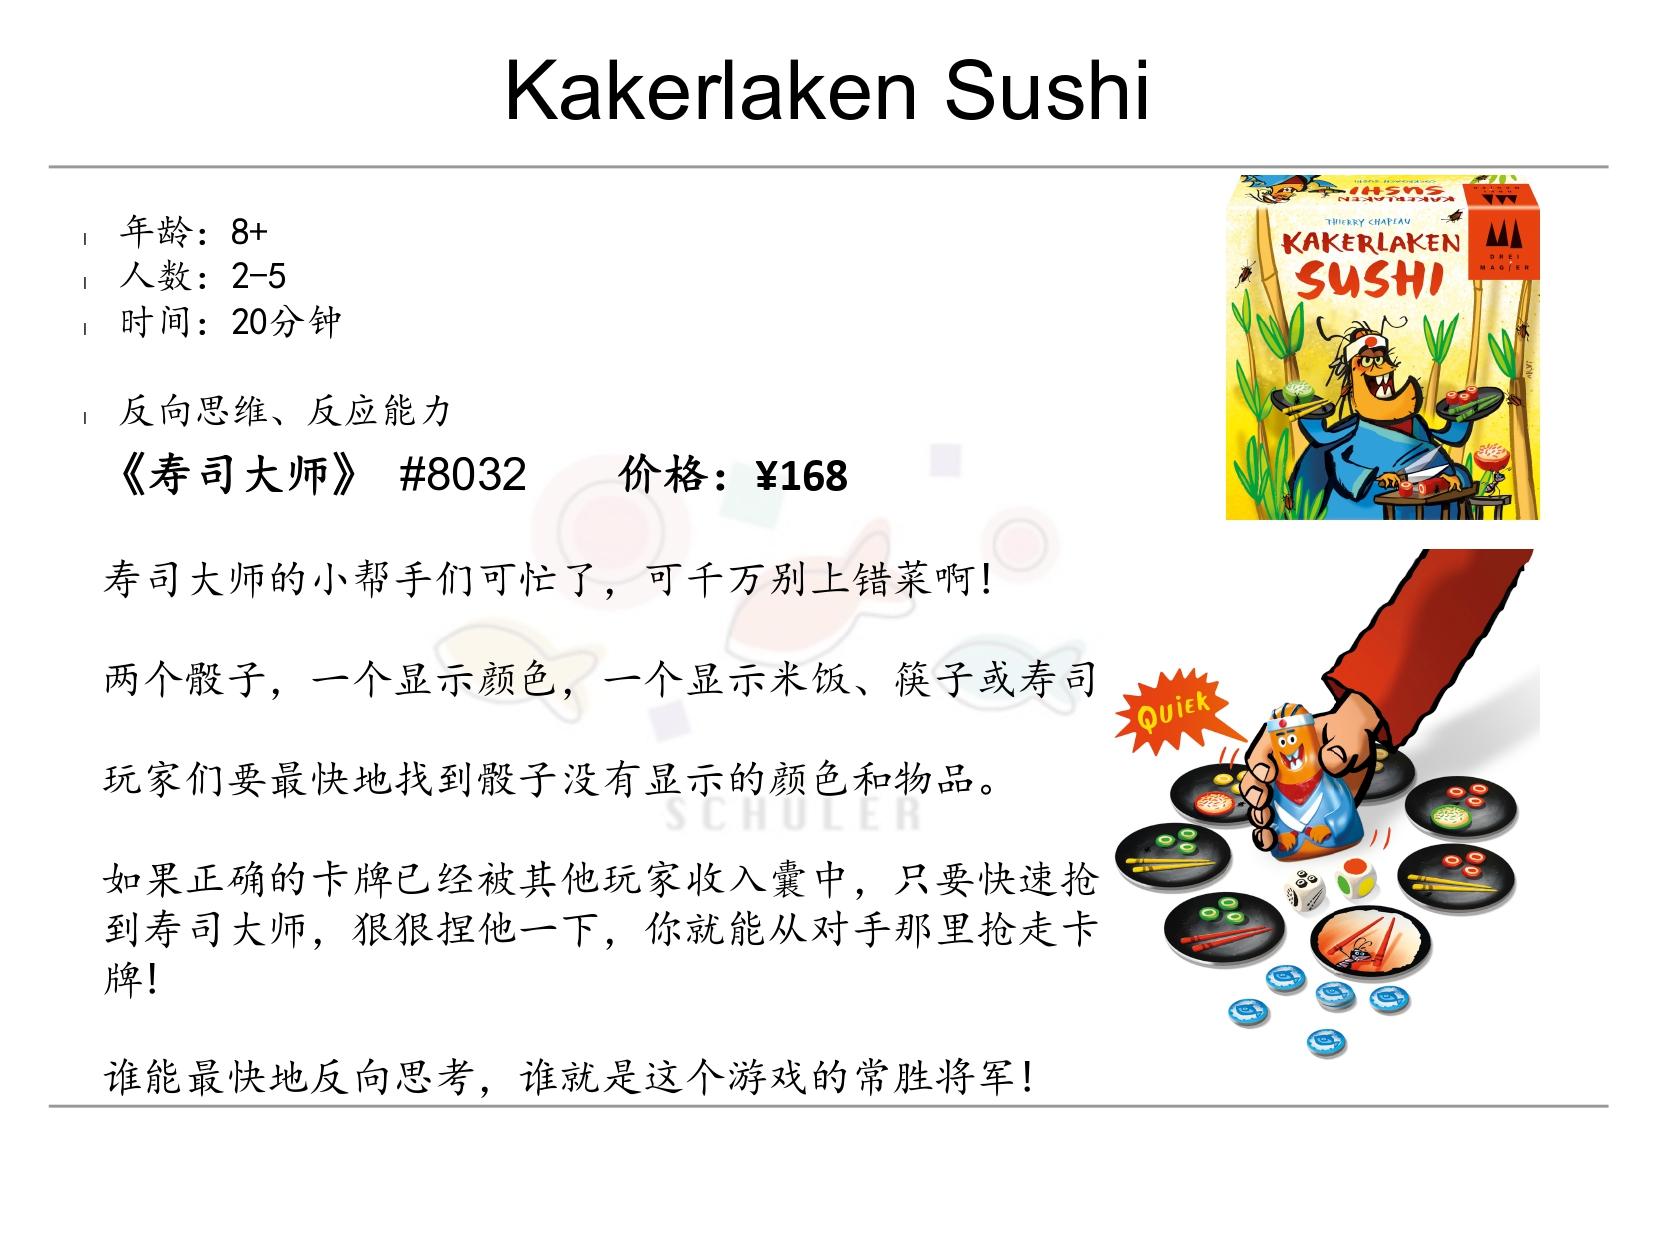 Kakerlaken Sushi  寿司大师